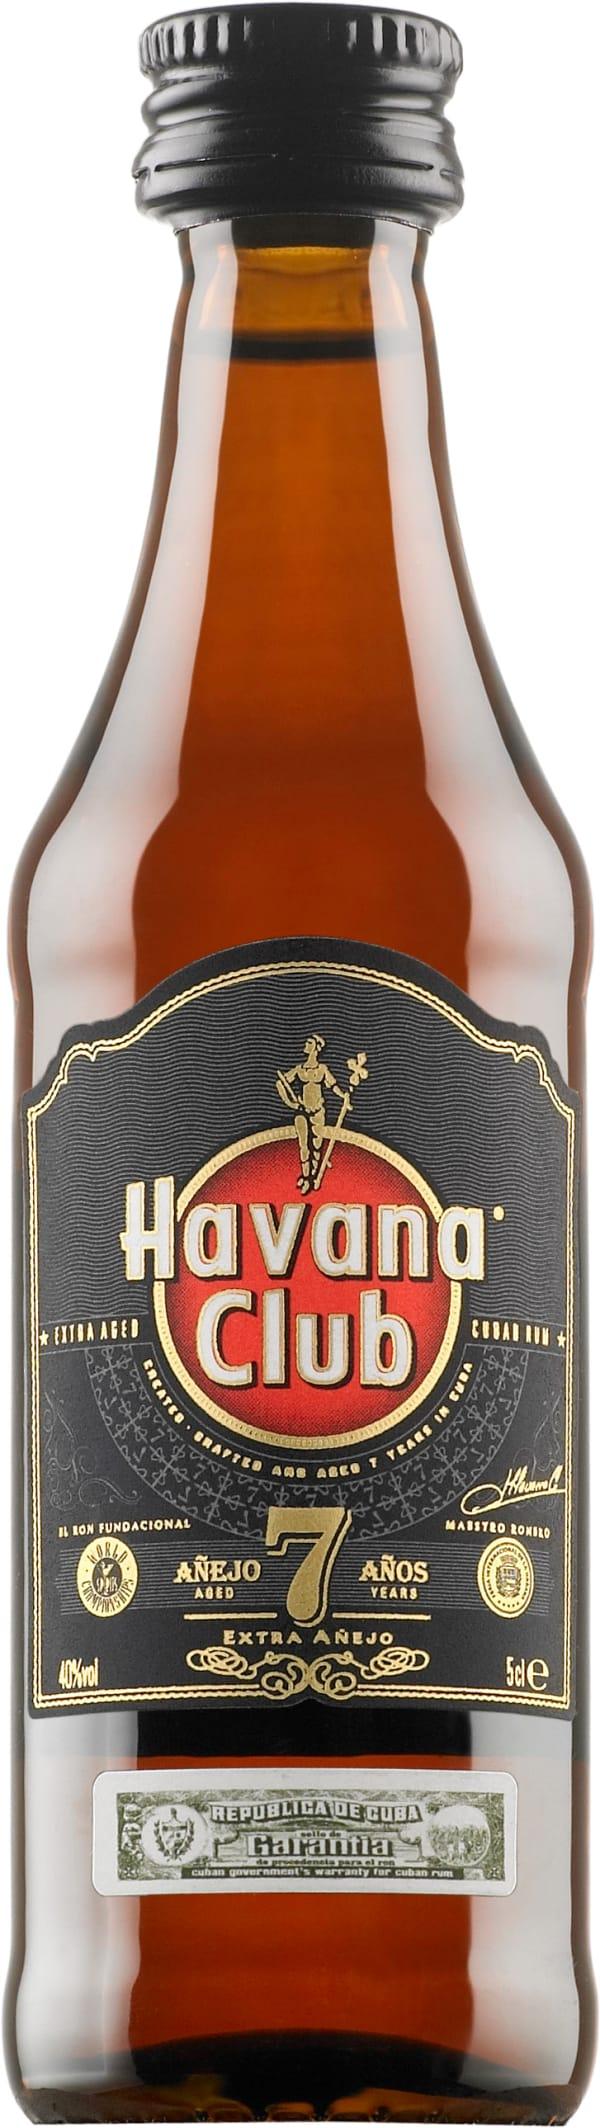 Havana Club Añejo 7 Años plastic bottle